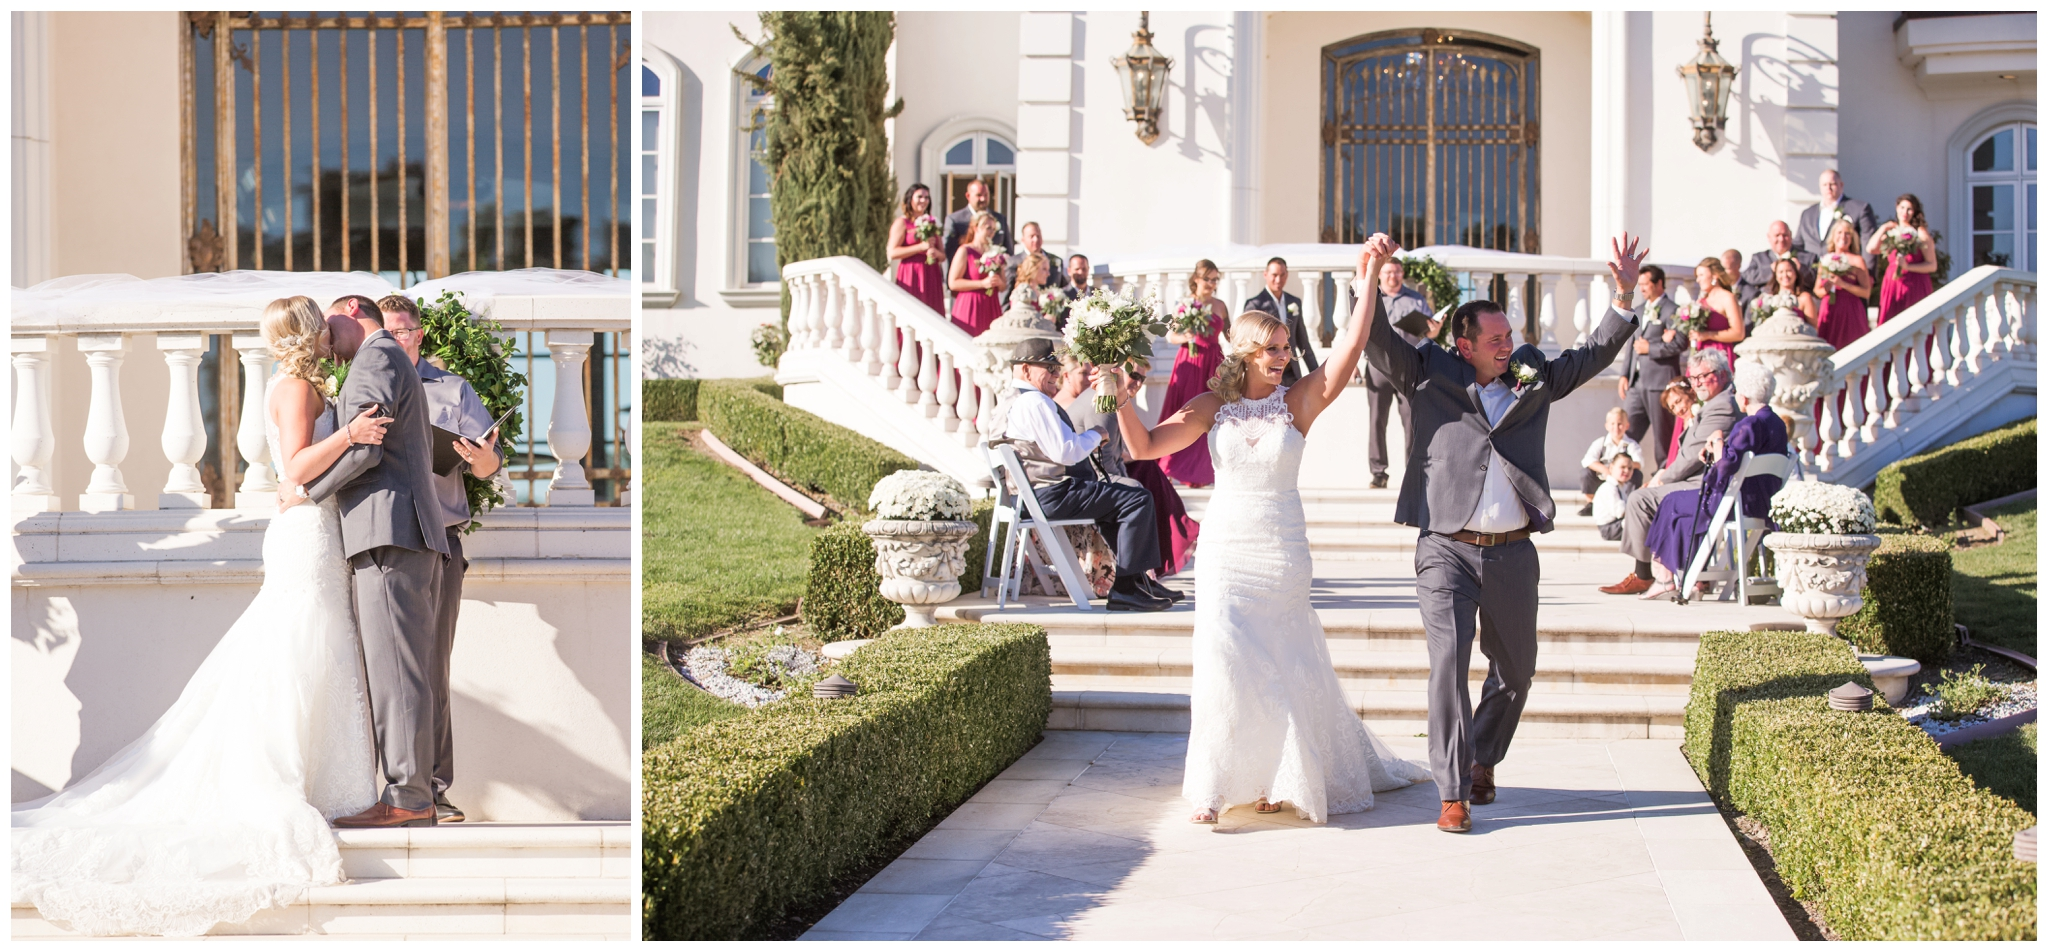 kassie_heath_cottonwood_wedding_blog_0023.jpg